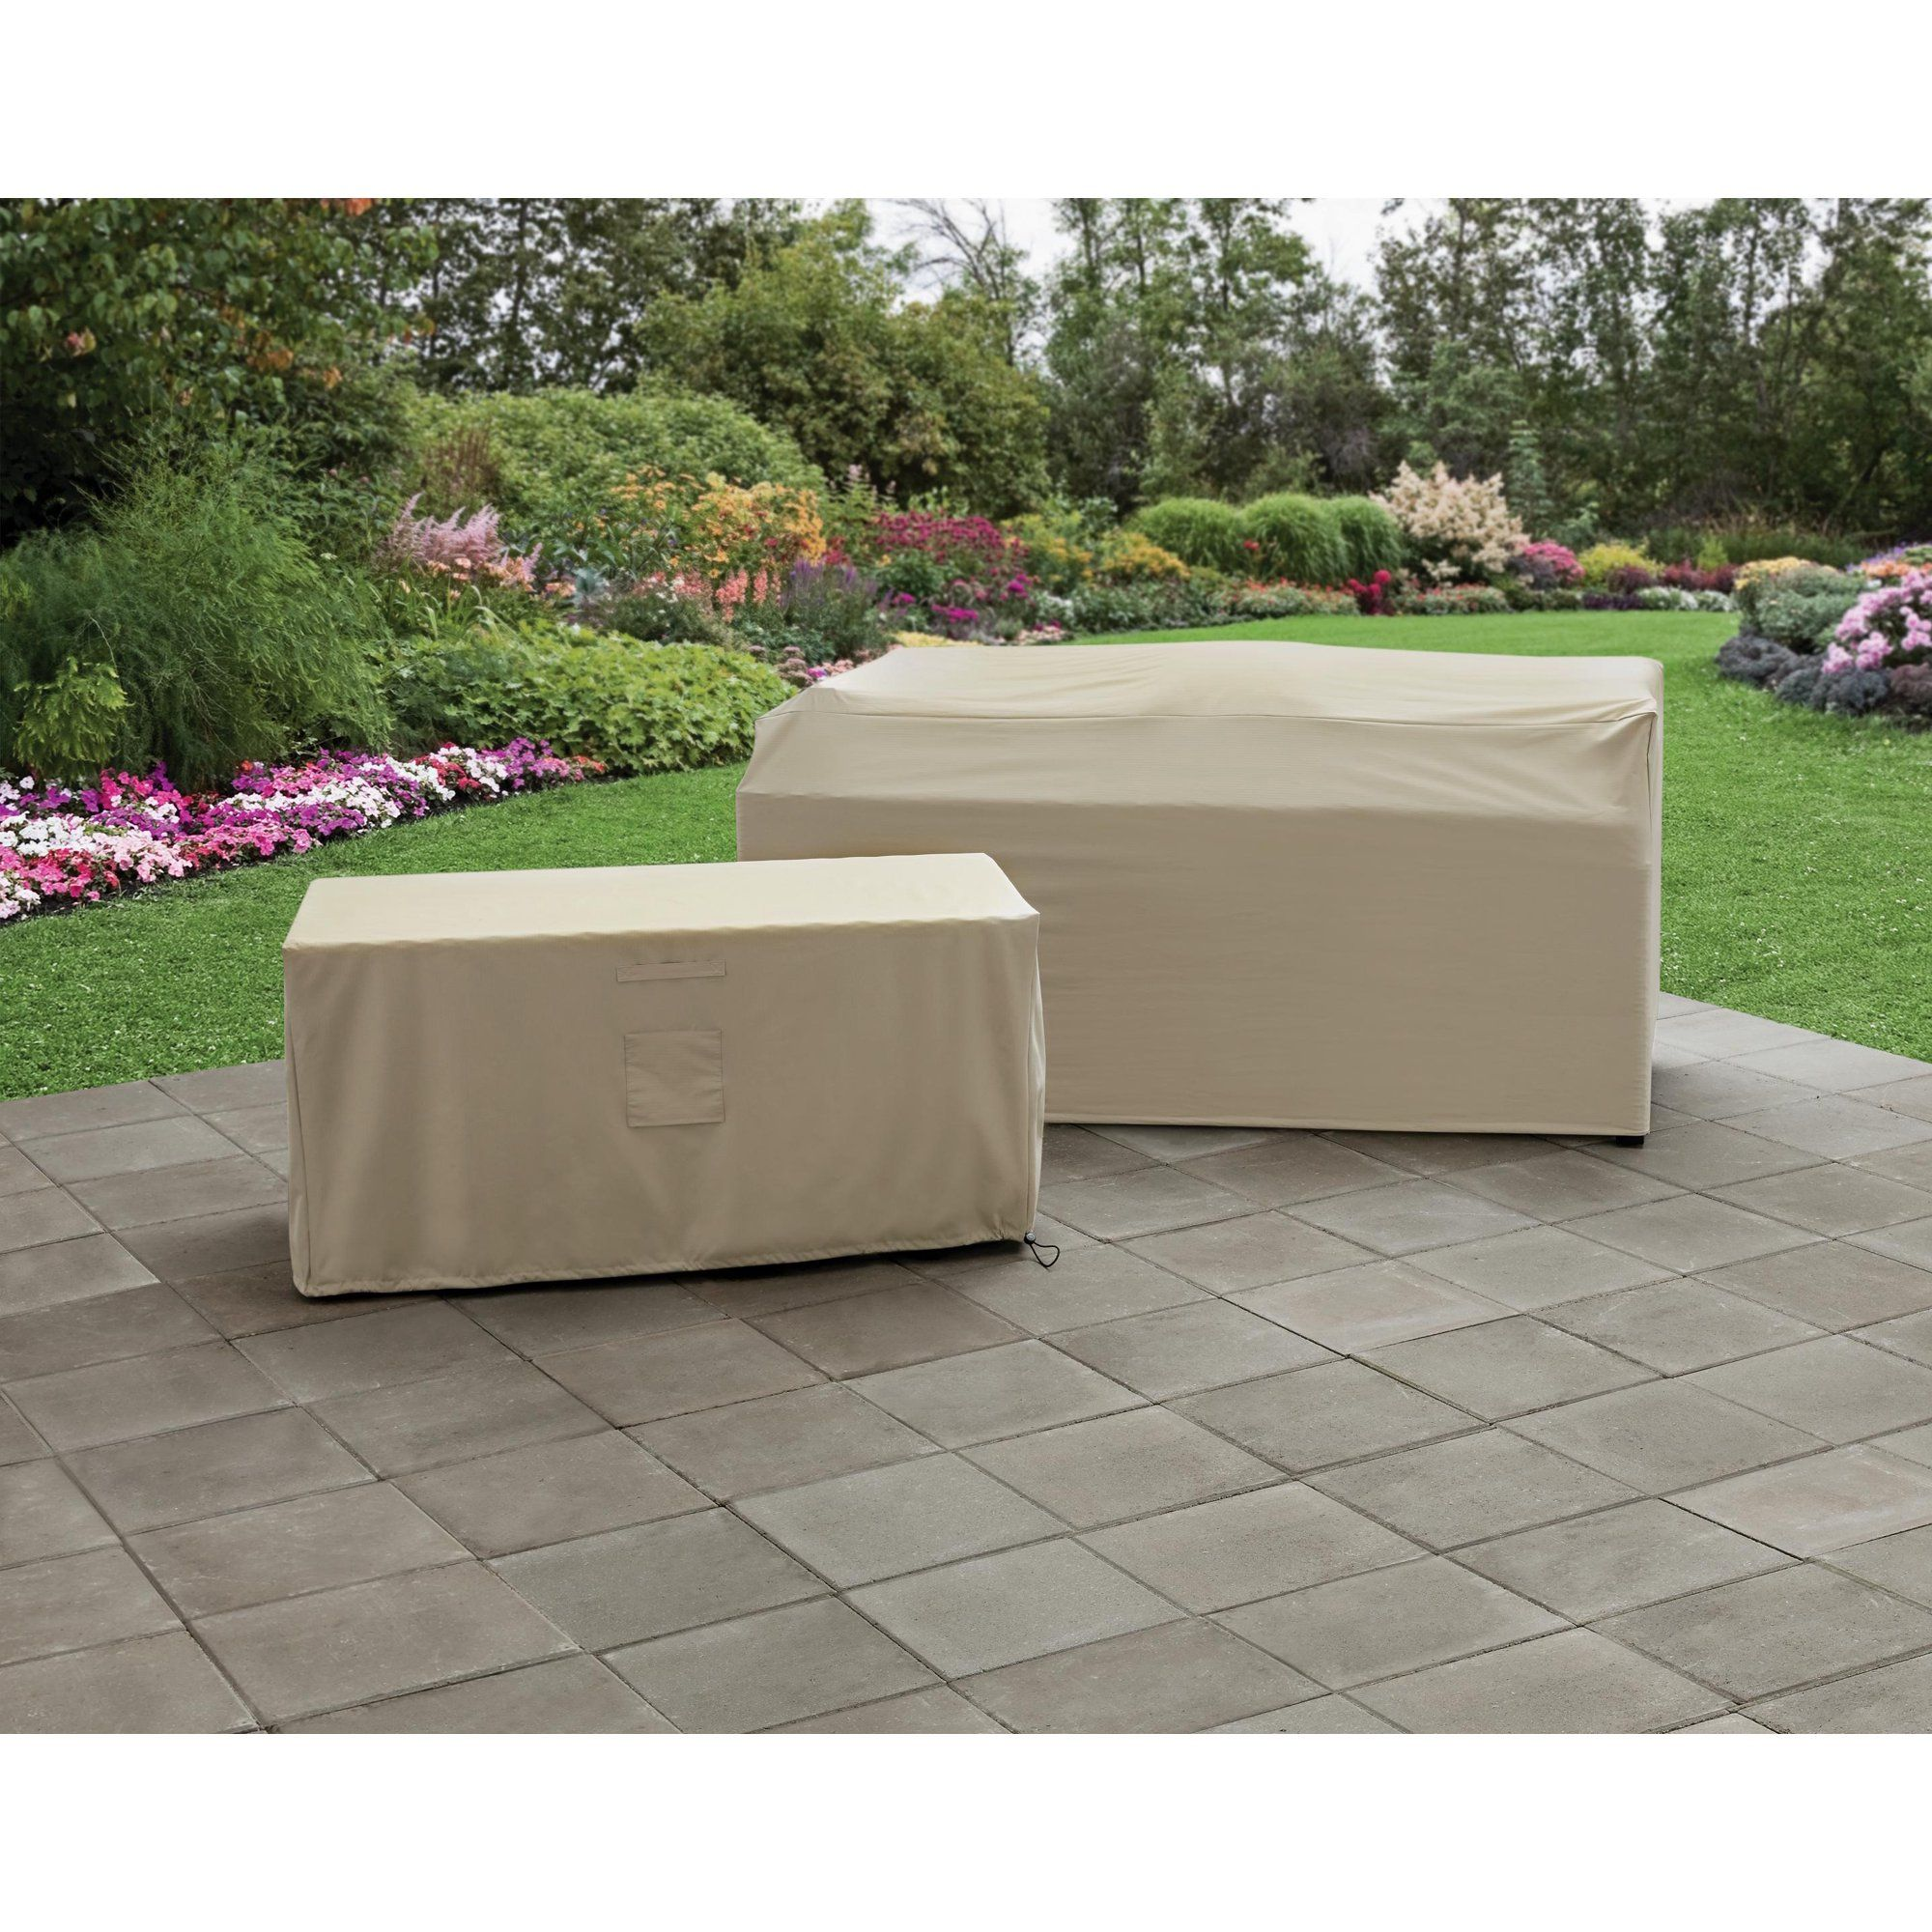 729a5993058eacff26792604018fd771 - Better Homes And Gardens Brookbury 5 Piece Patio